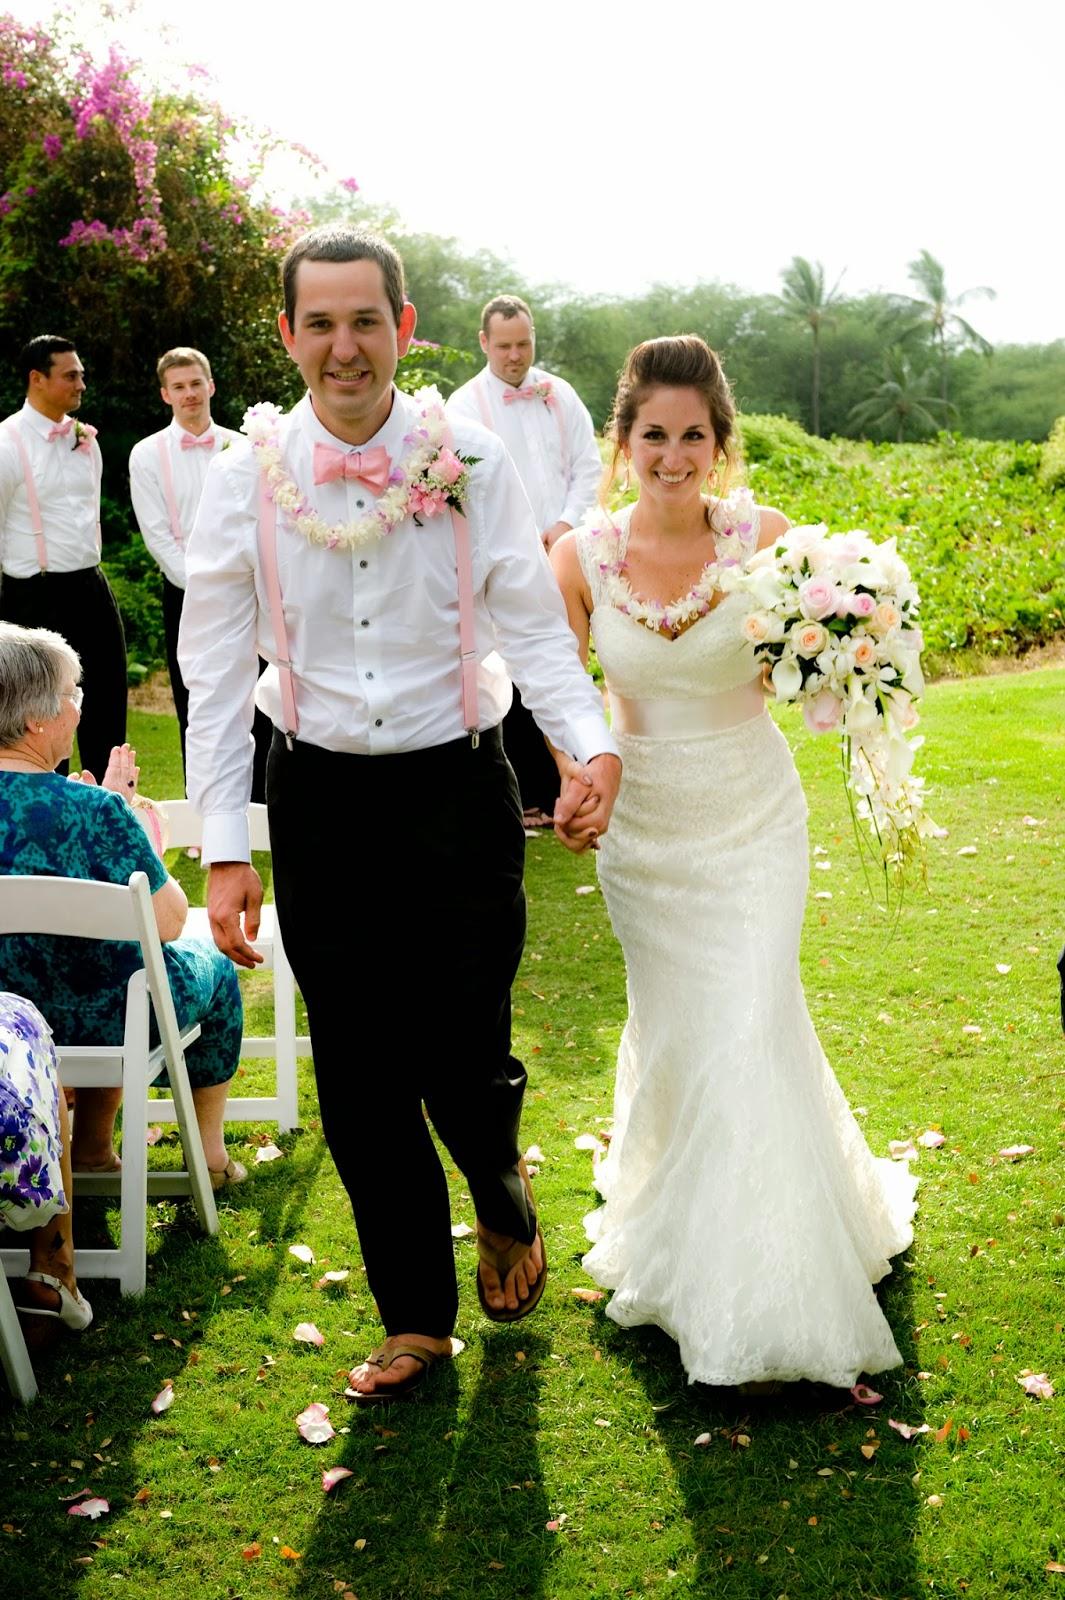 maui wedding planners, maui wedding photographers, maui weddings, hawaii wedding planners